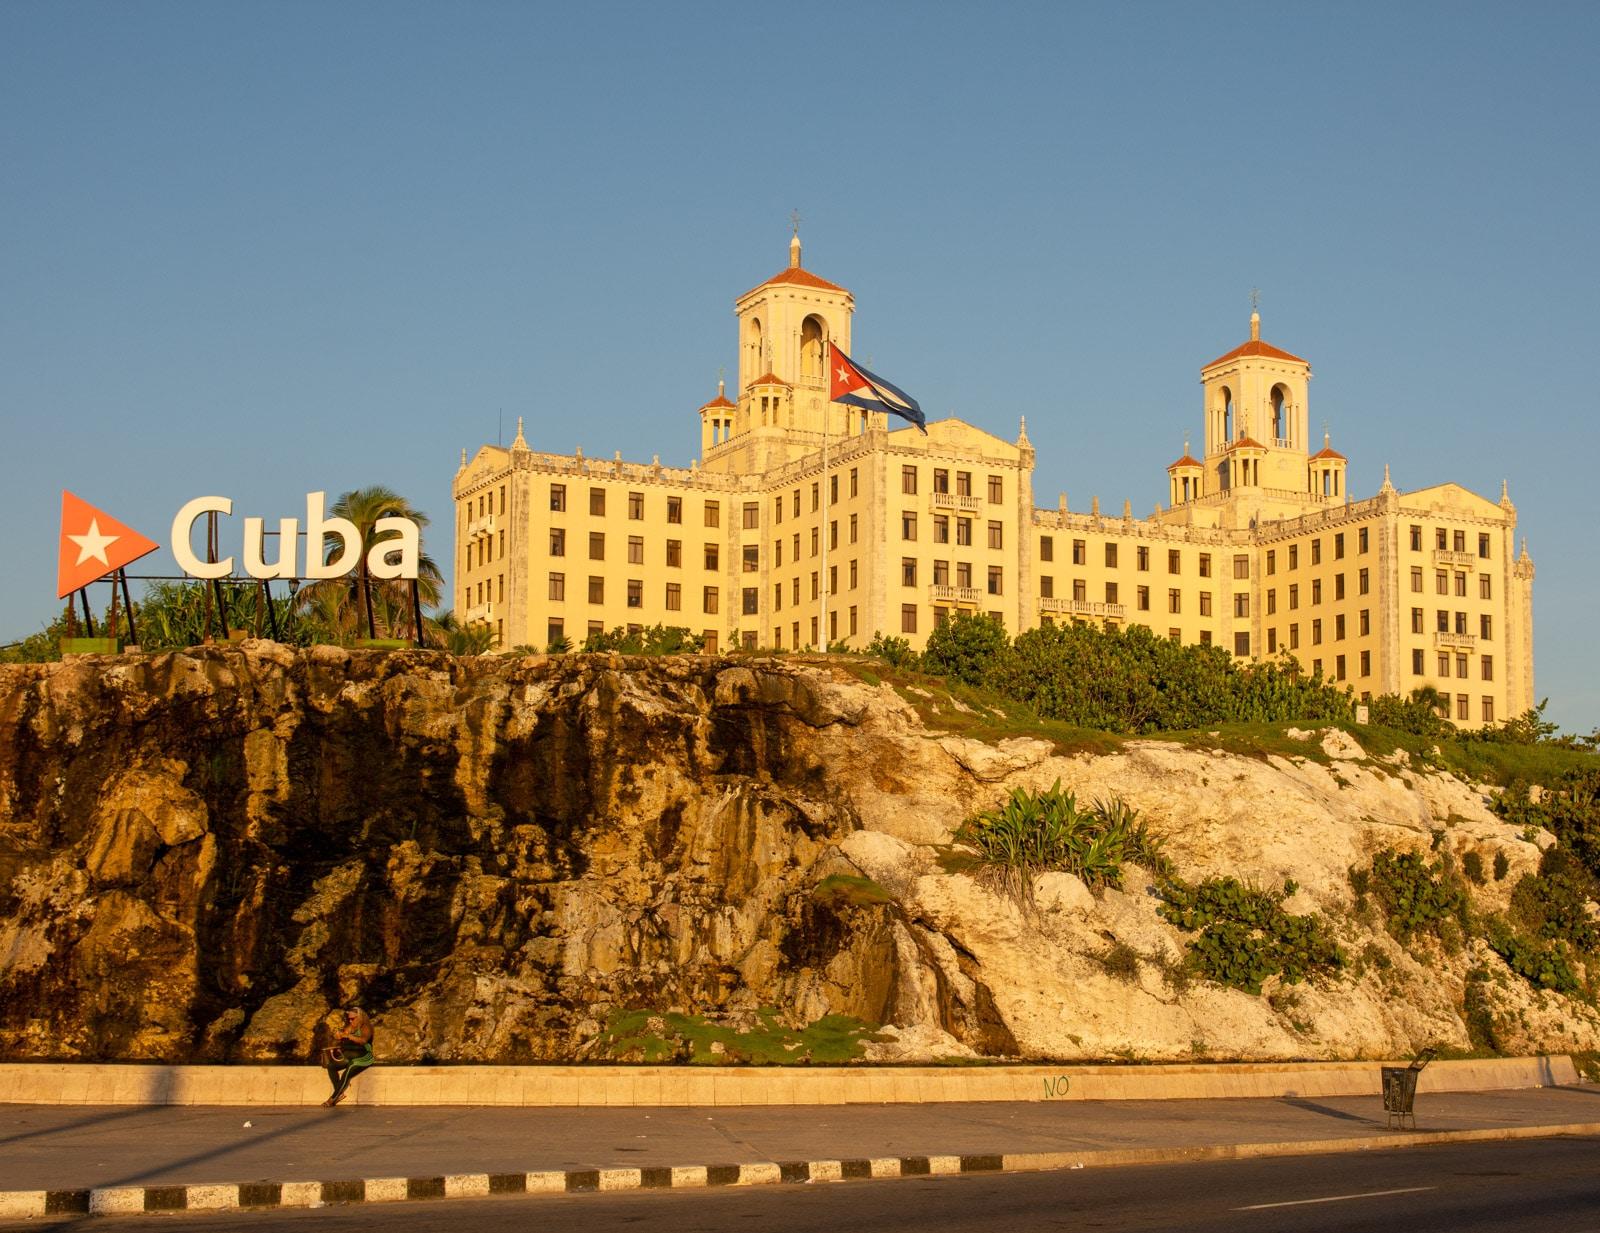 Hotel Nacional de Cuba w Hawanie